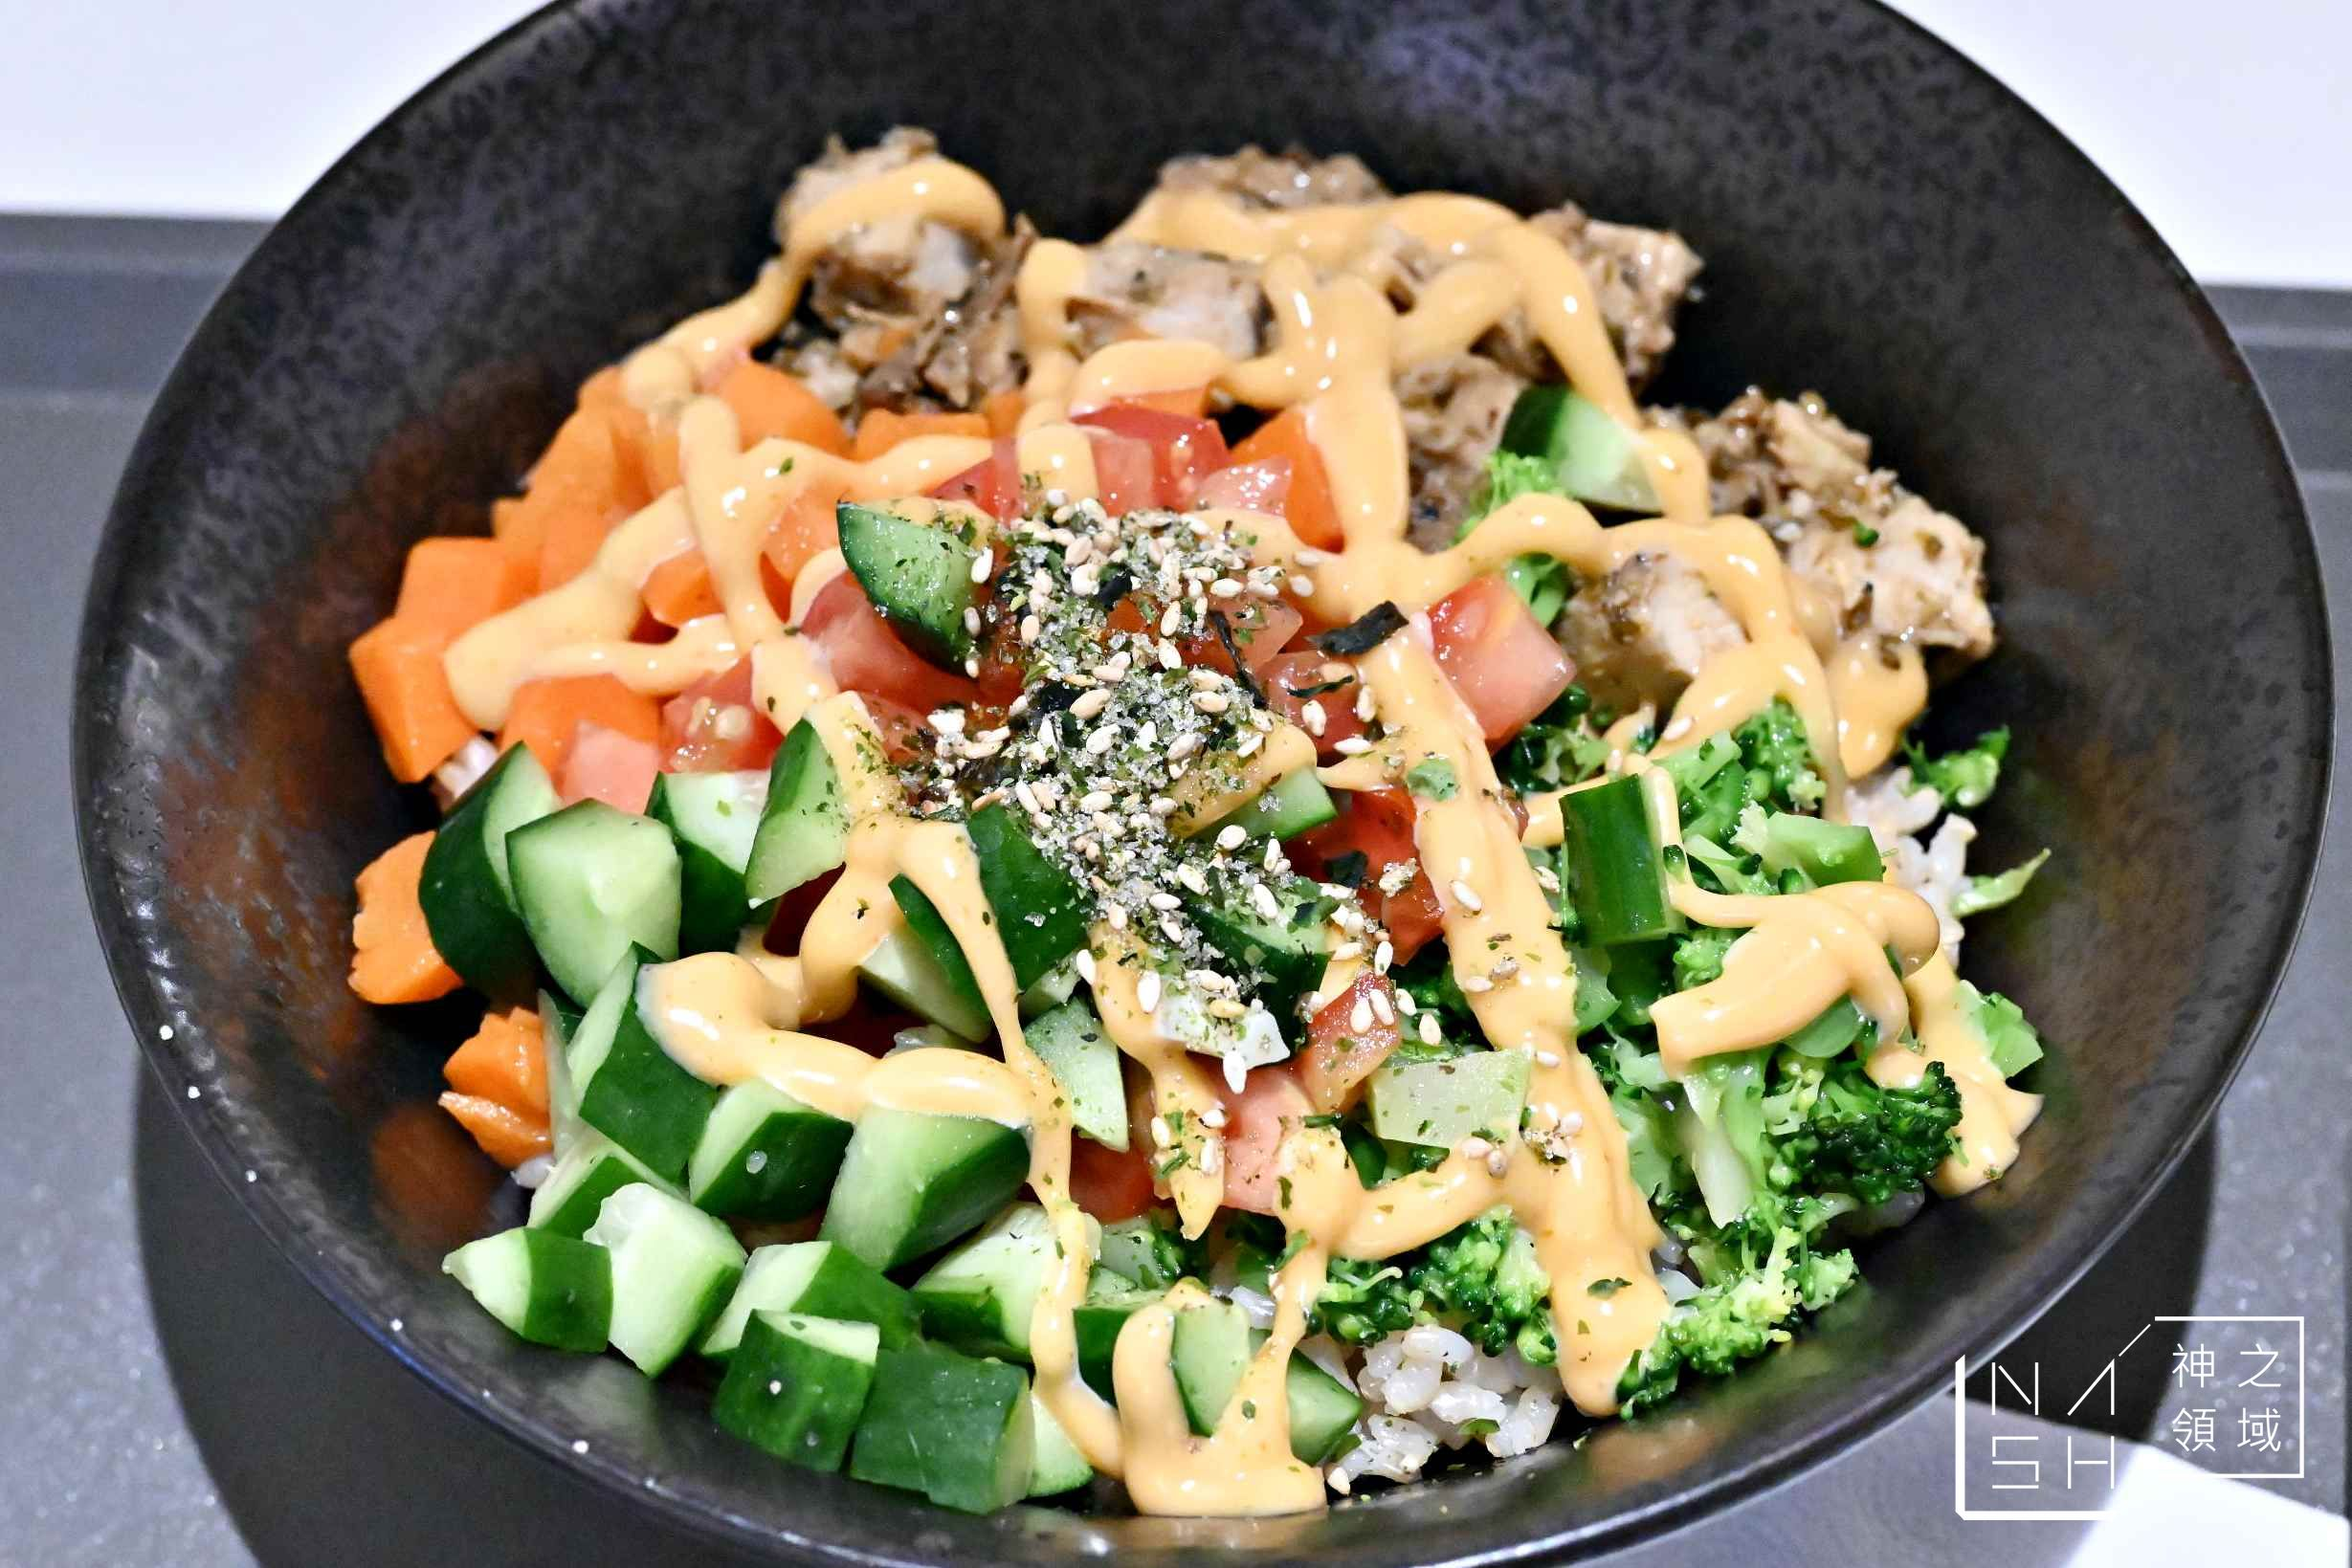 JJ's POKE & CAFE 鮮魚沙拉飯